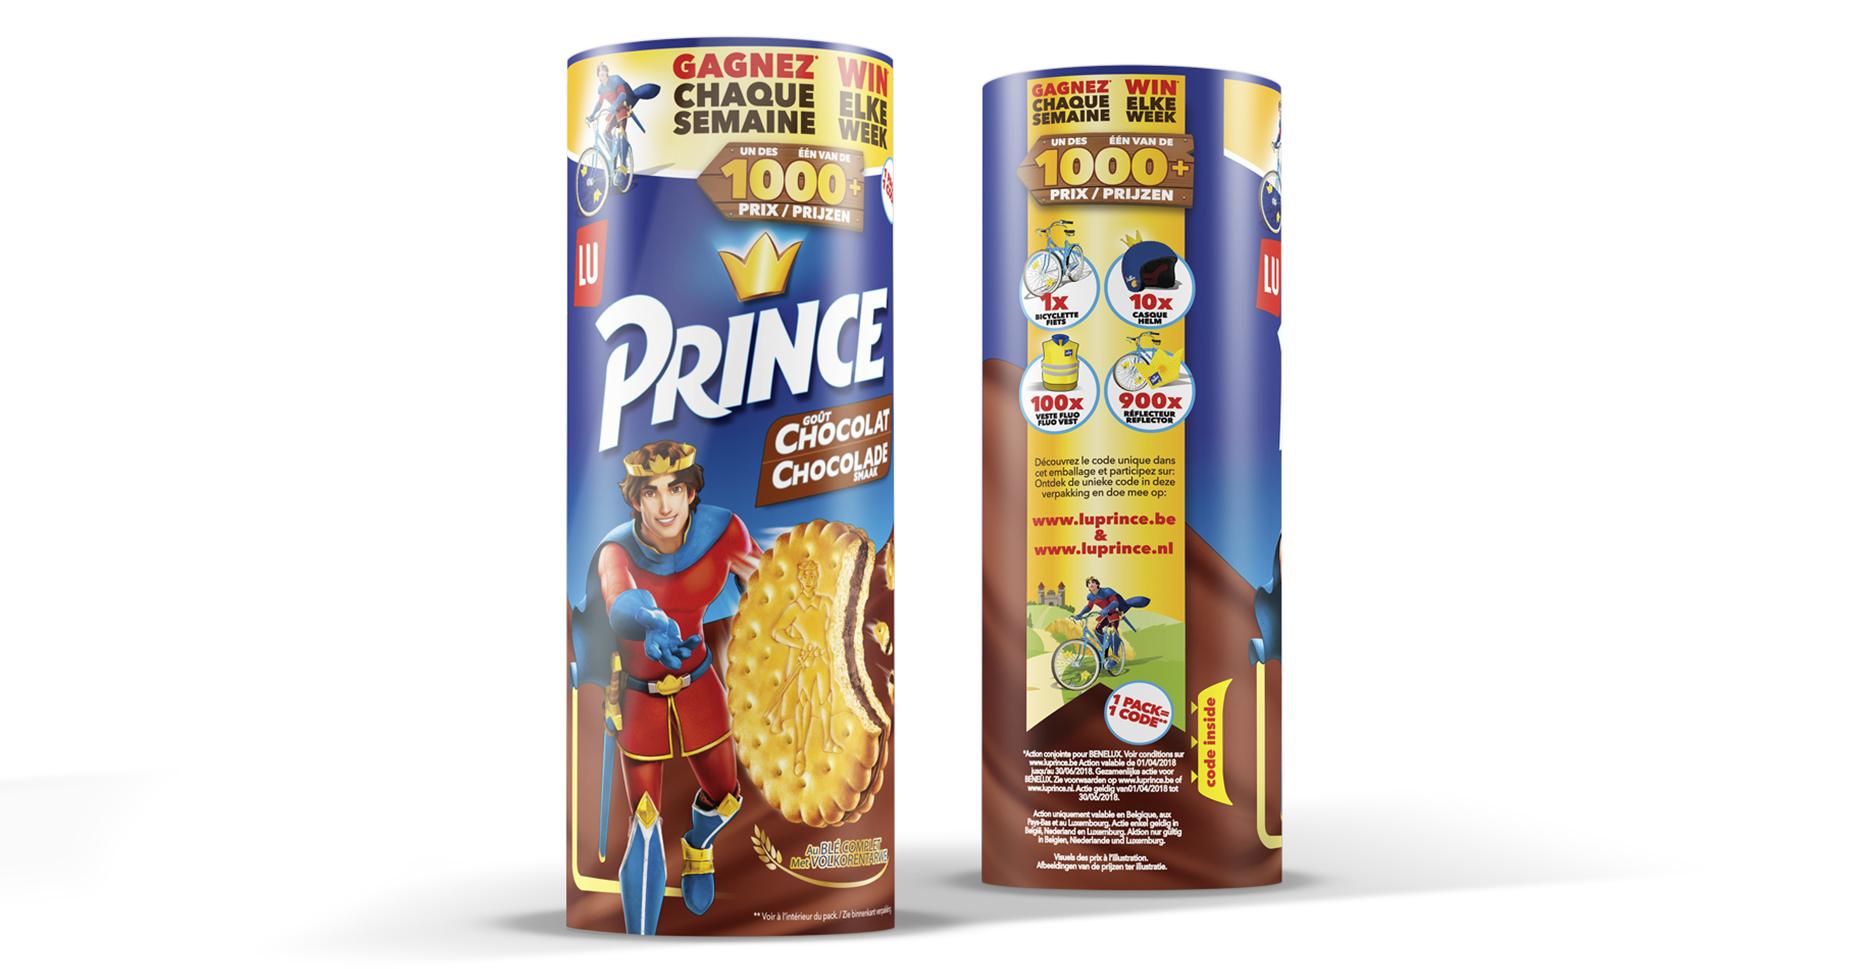 Prince_case_0005.jpg